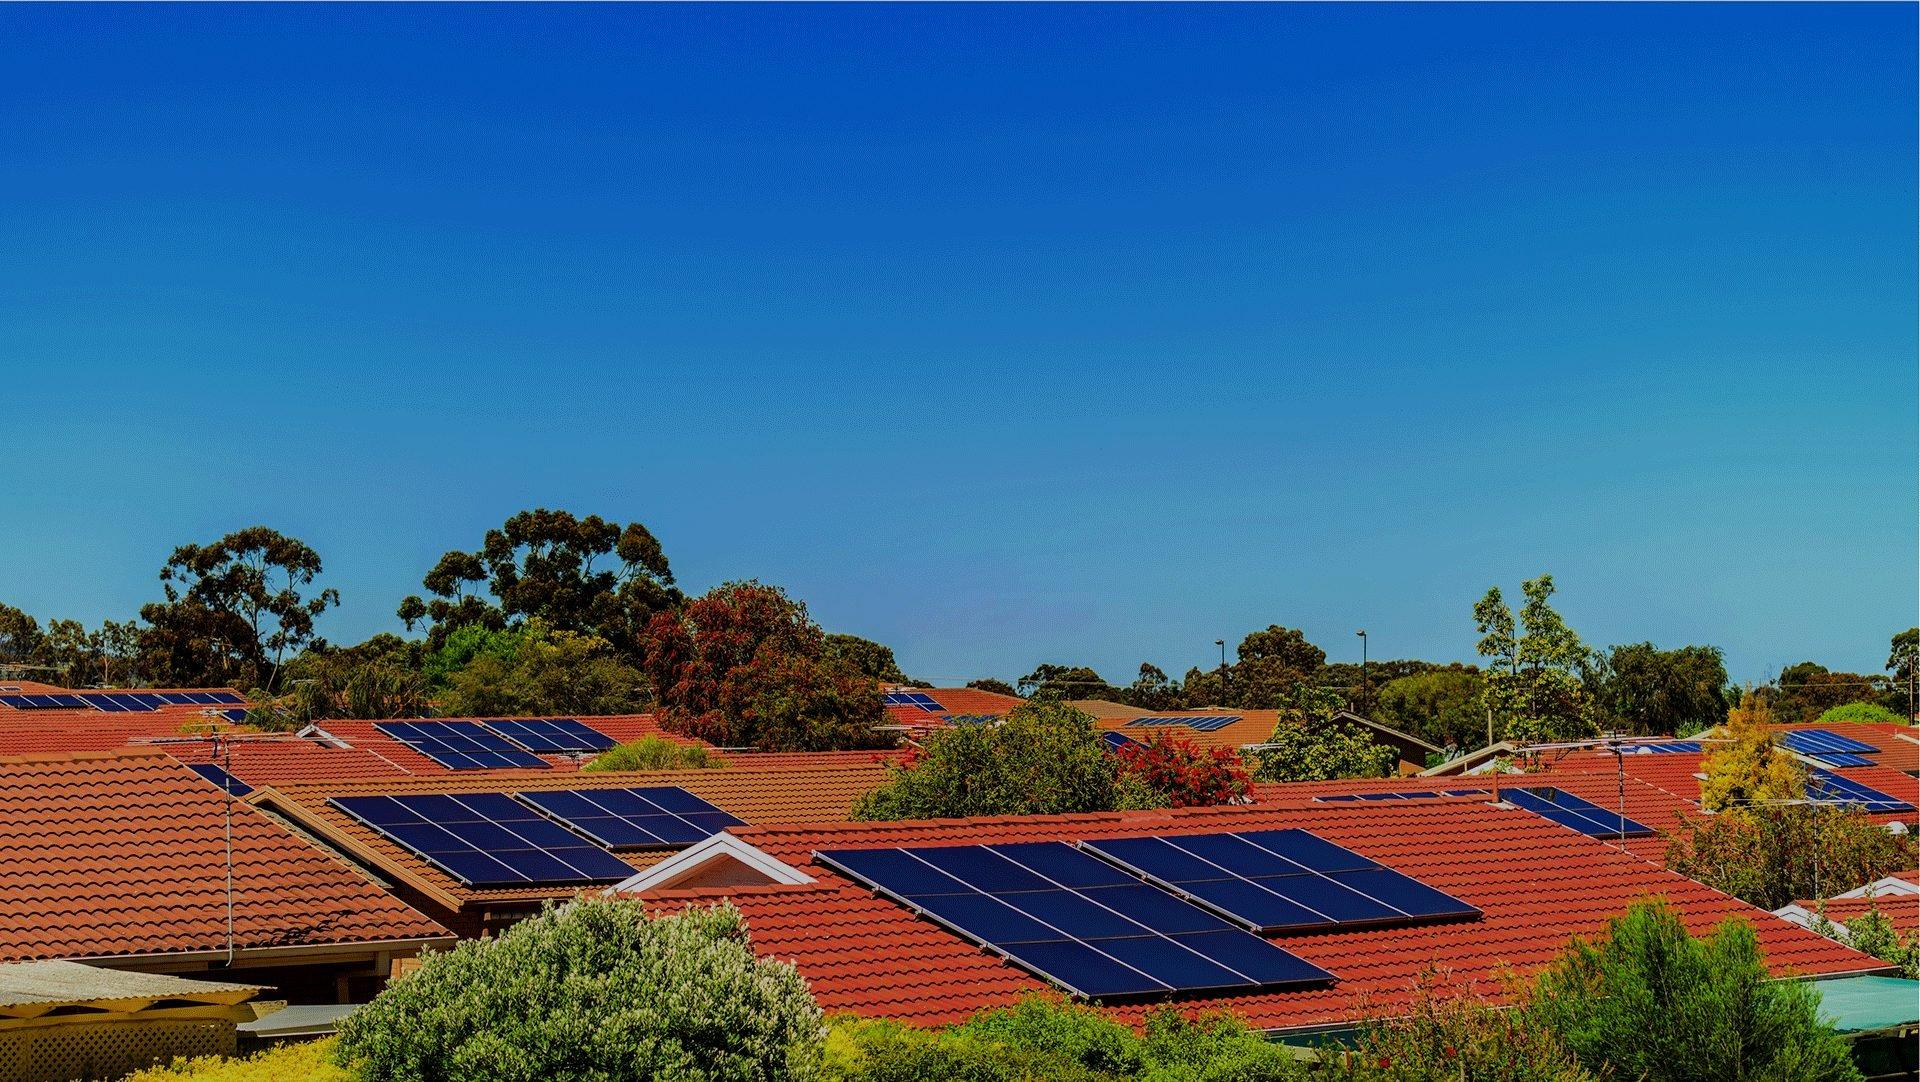 Ipsun Power solar panels